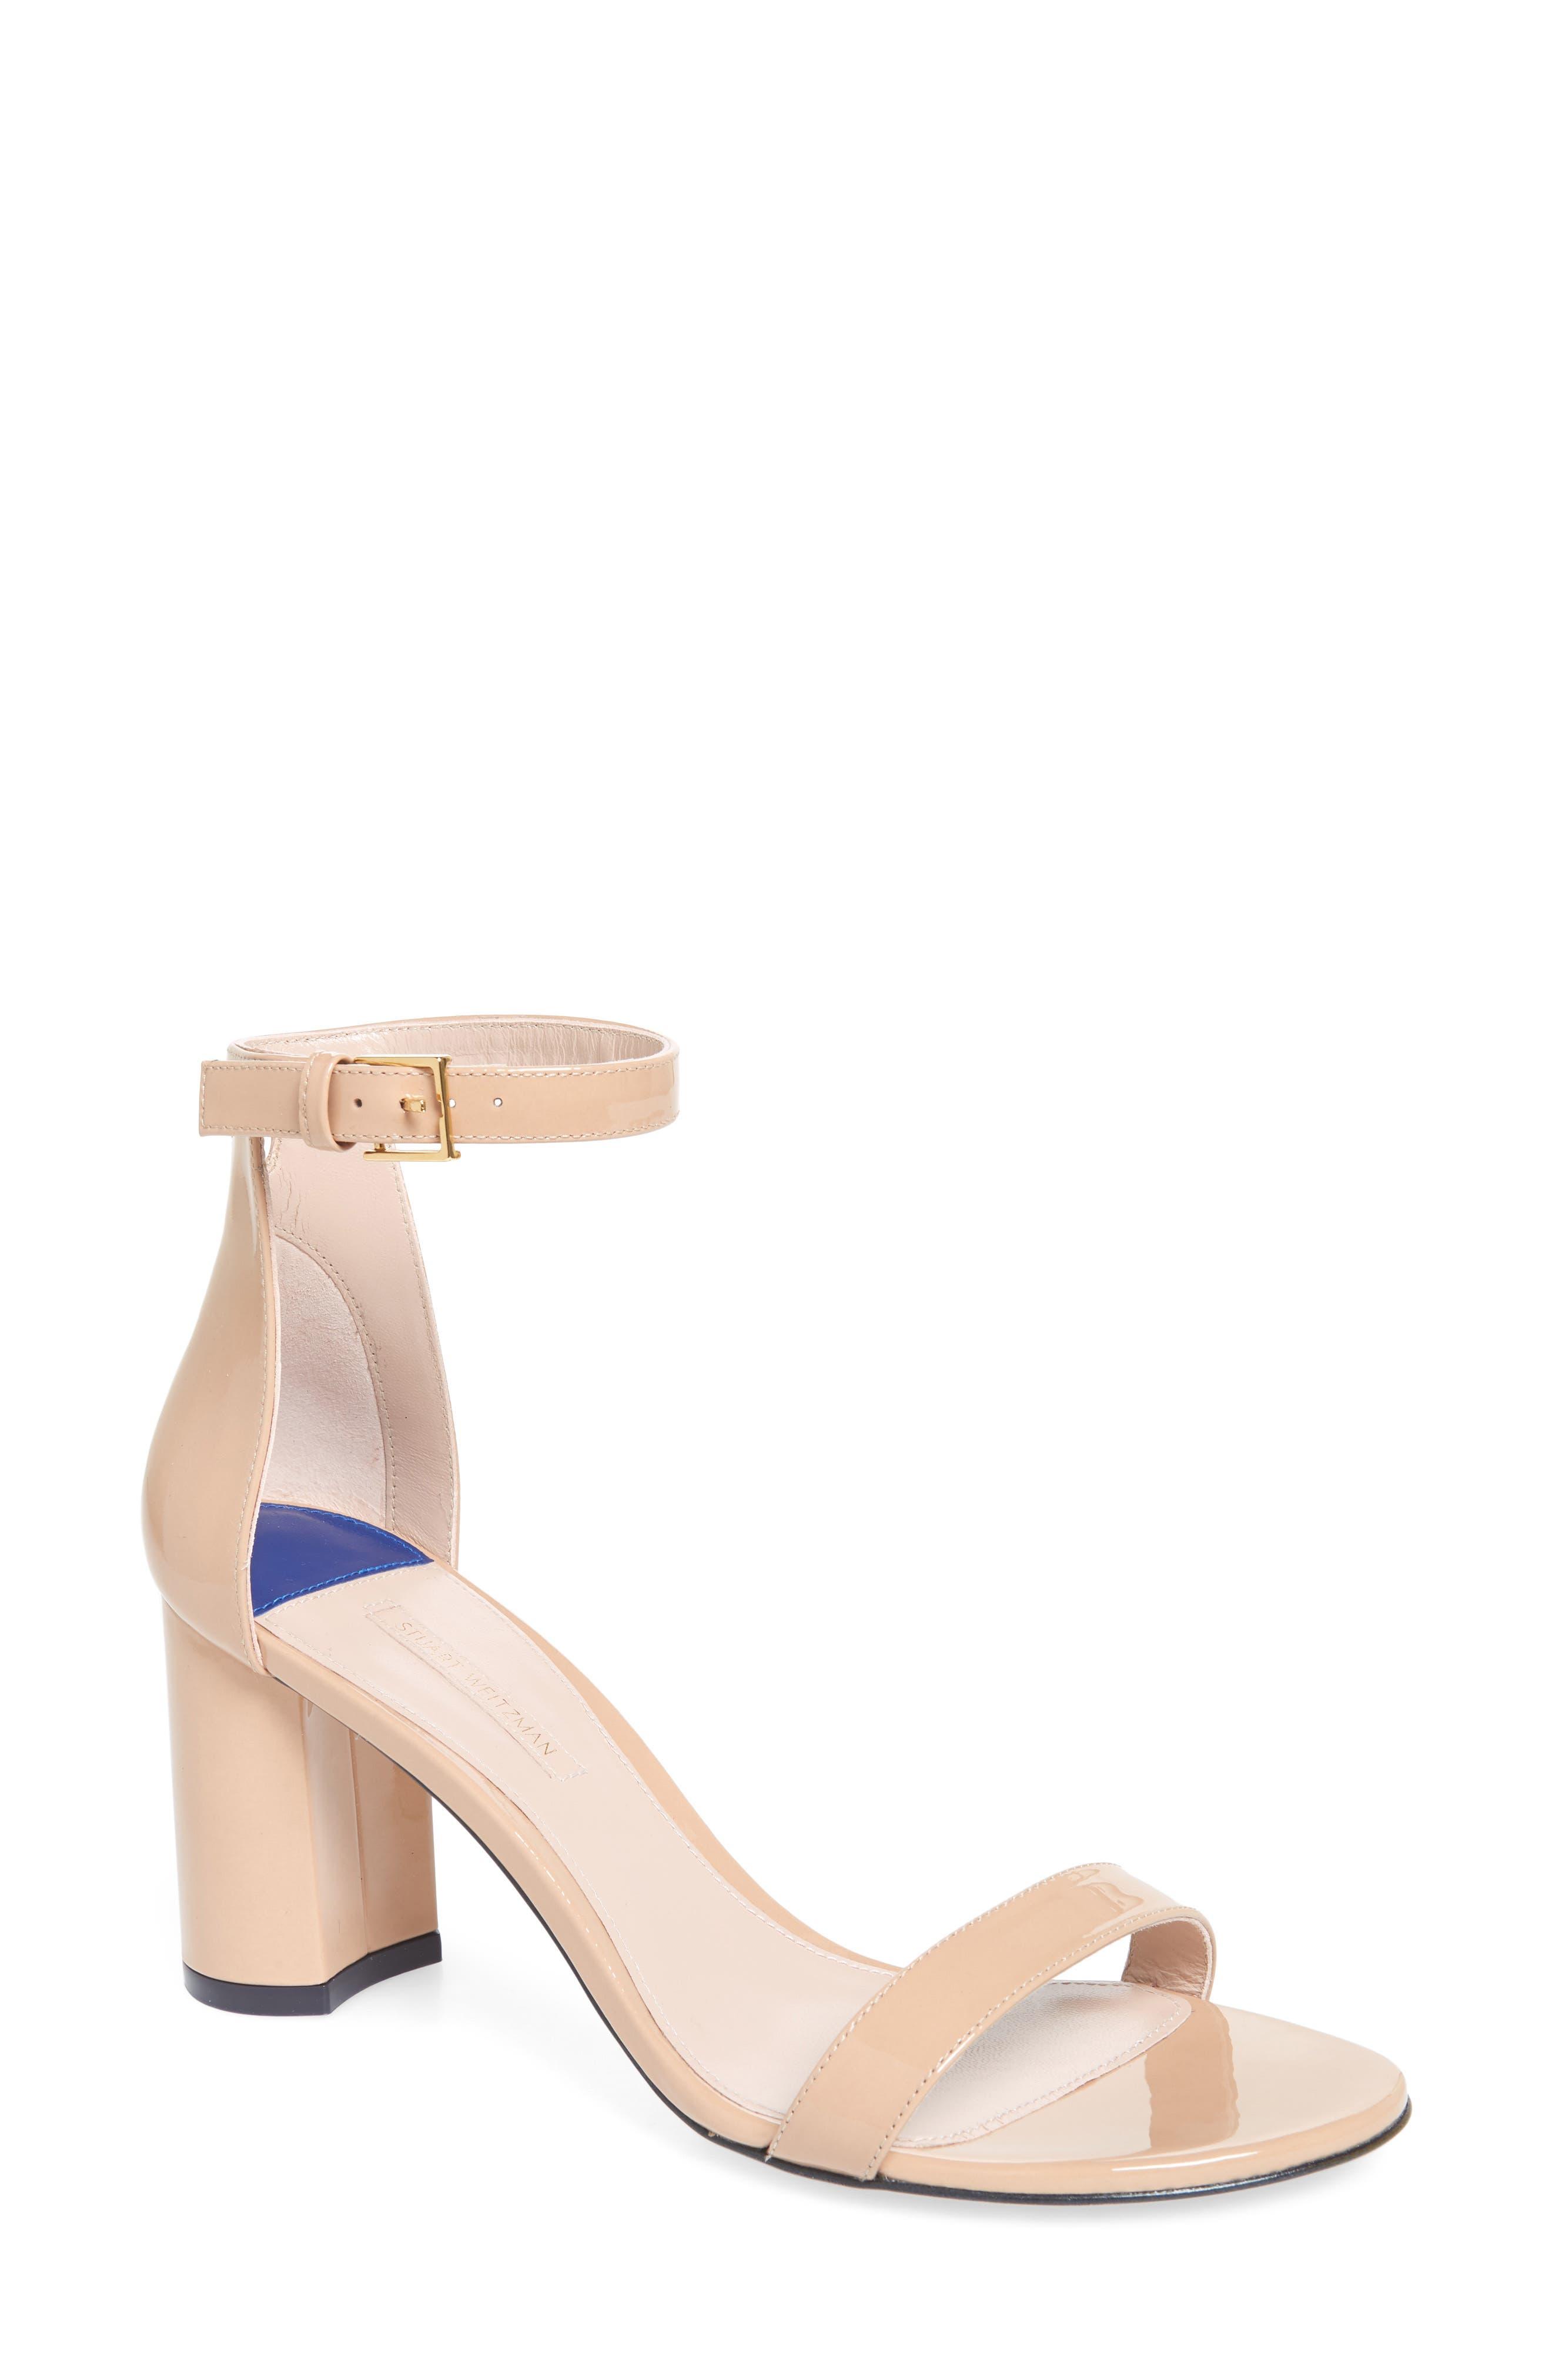 75LESSNUDIST Ankle Strap Sandal,                             Main thumbnail 1, color,                             ADOBE CRISTAL